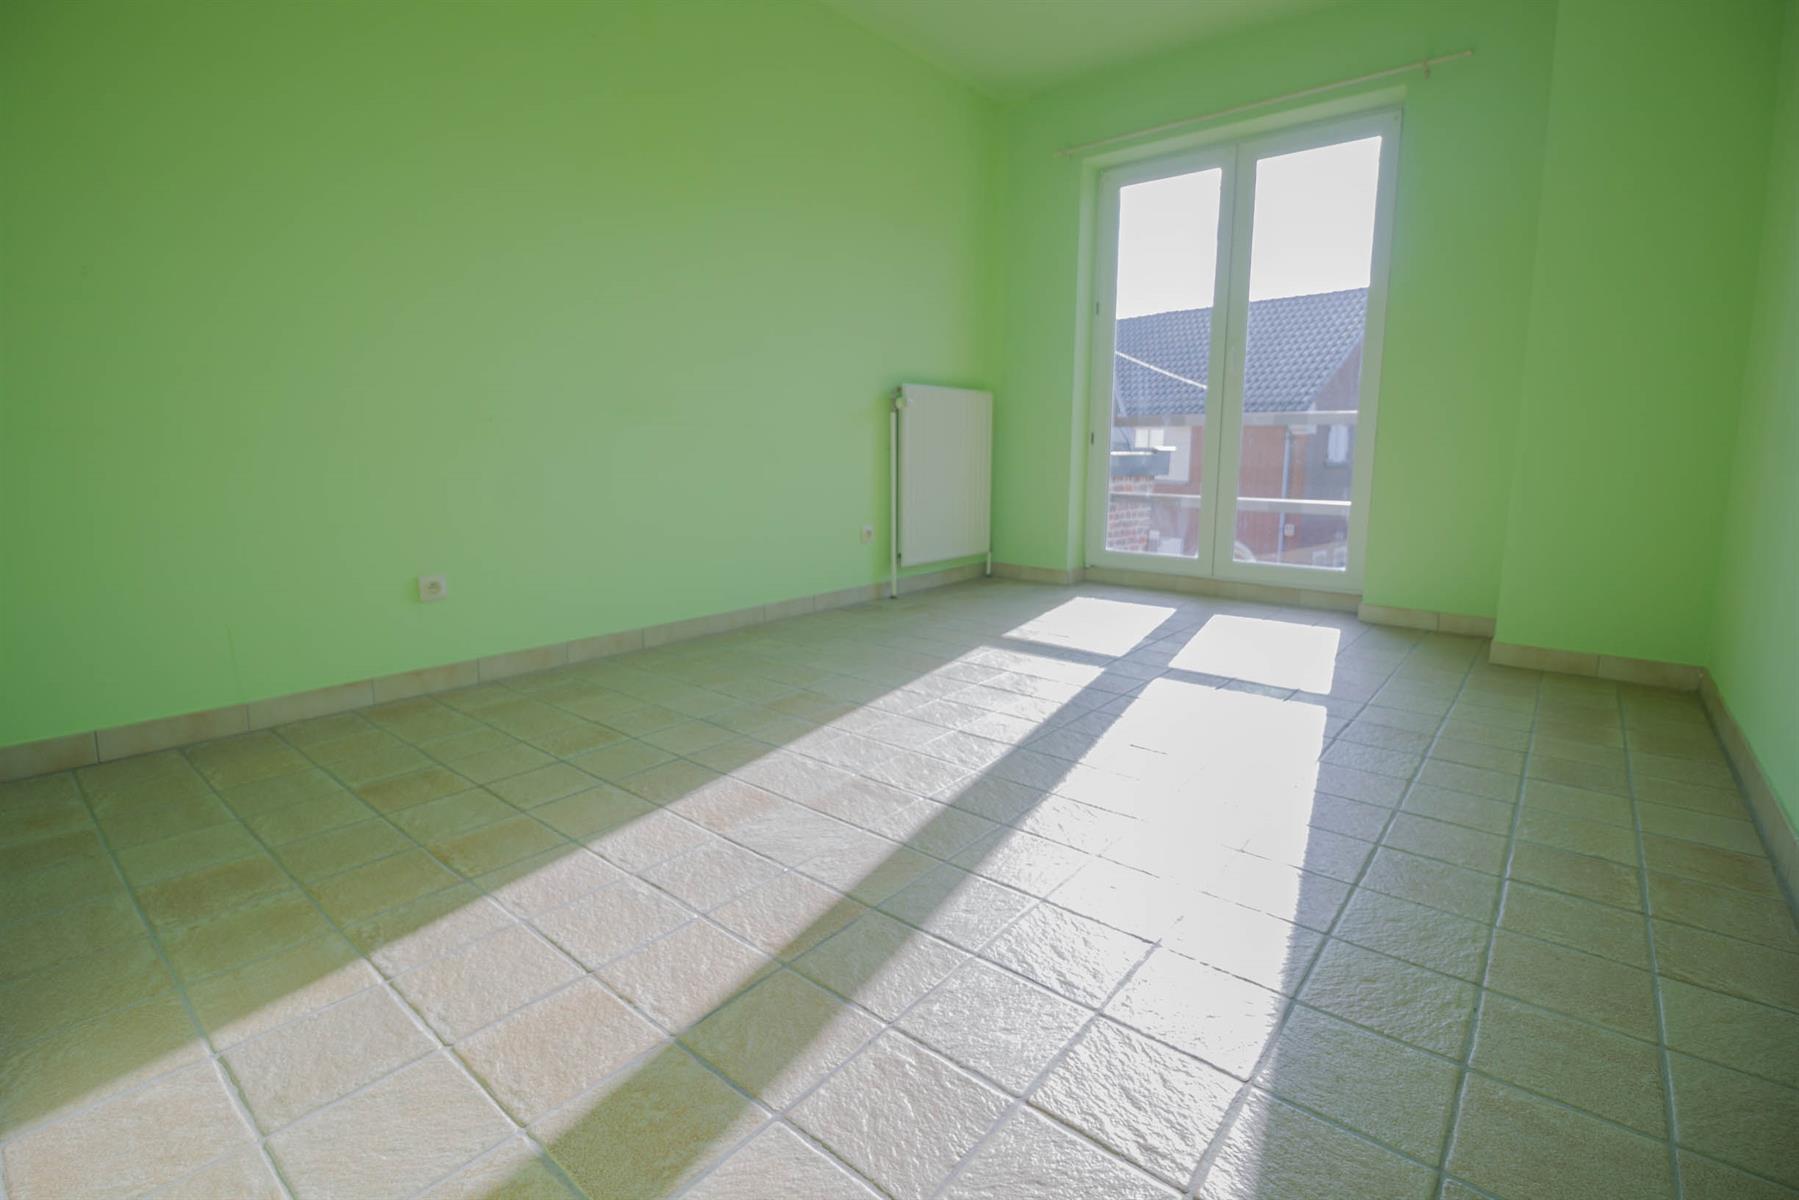 Appartement - Courcelles - #4226901-14